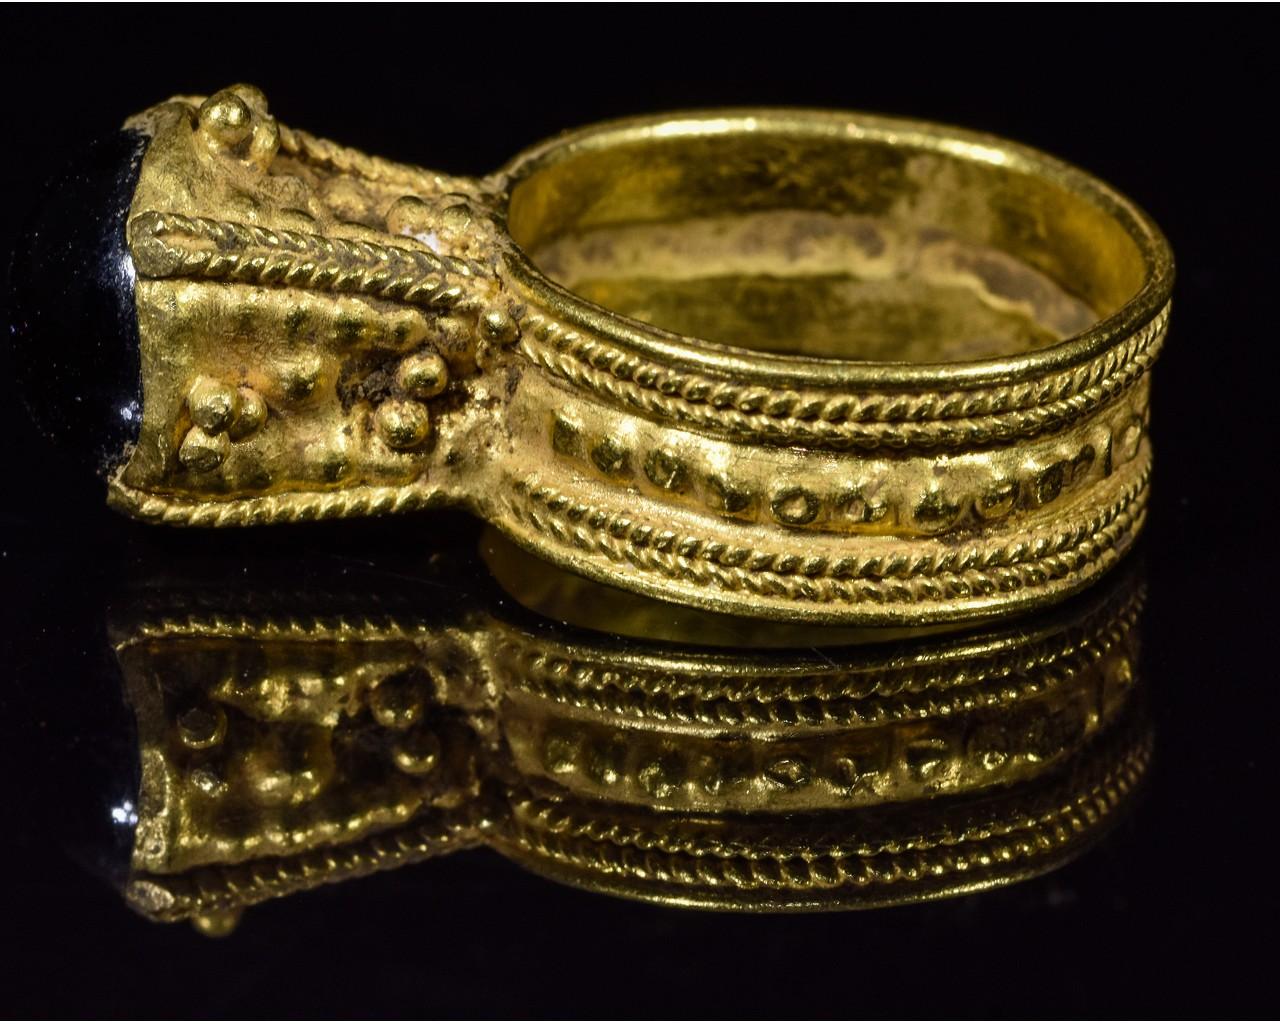 MEROVINGIAN GOLD RING WITH GARNET STONE - Image 3 of 5